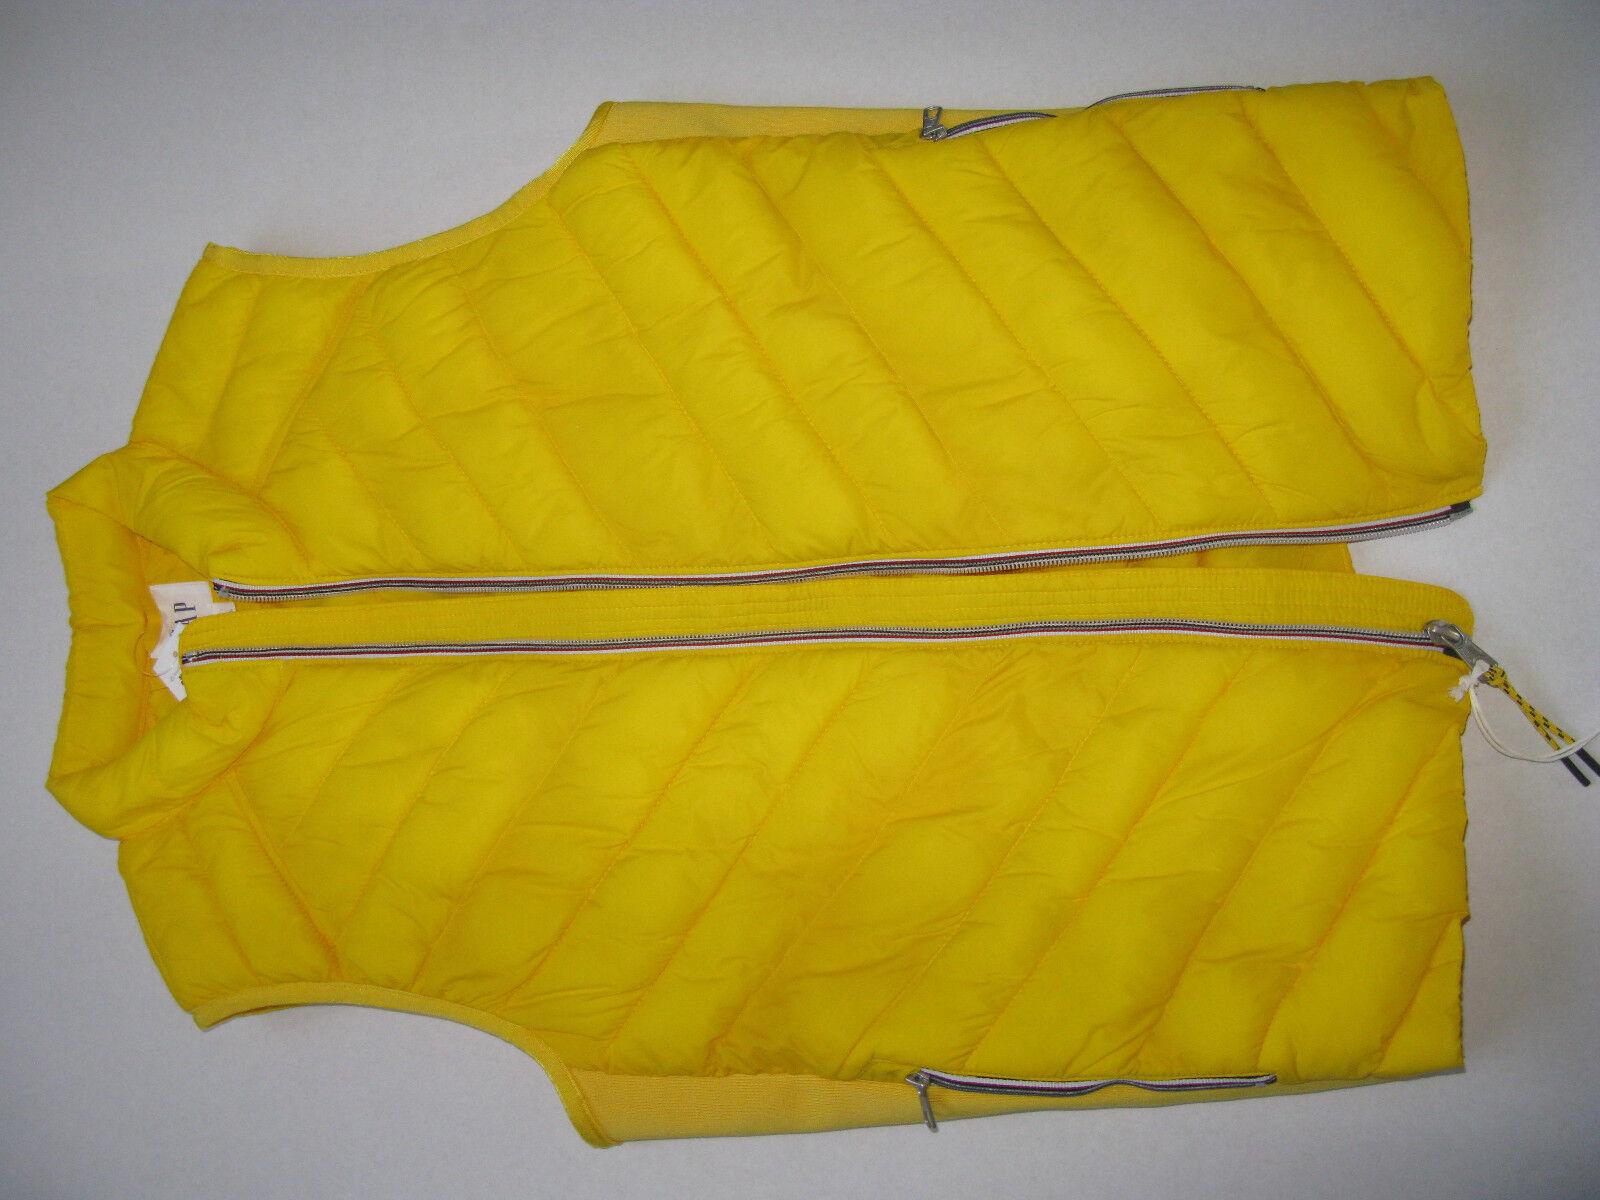 J GAP NEW warmer warm as 500 fill fill fill down fleece yellow water resistant waistcoat M 980116